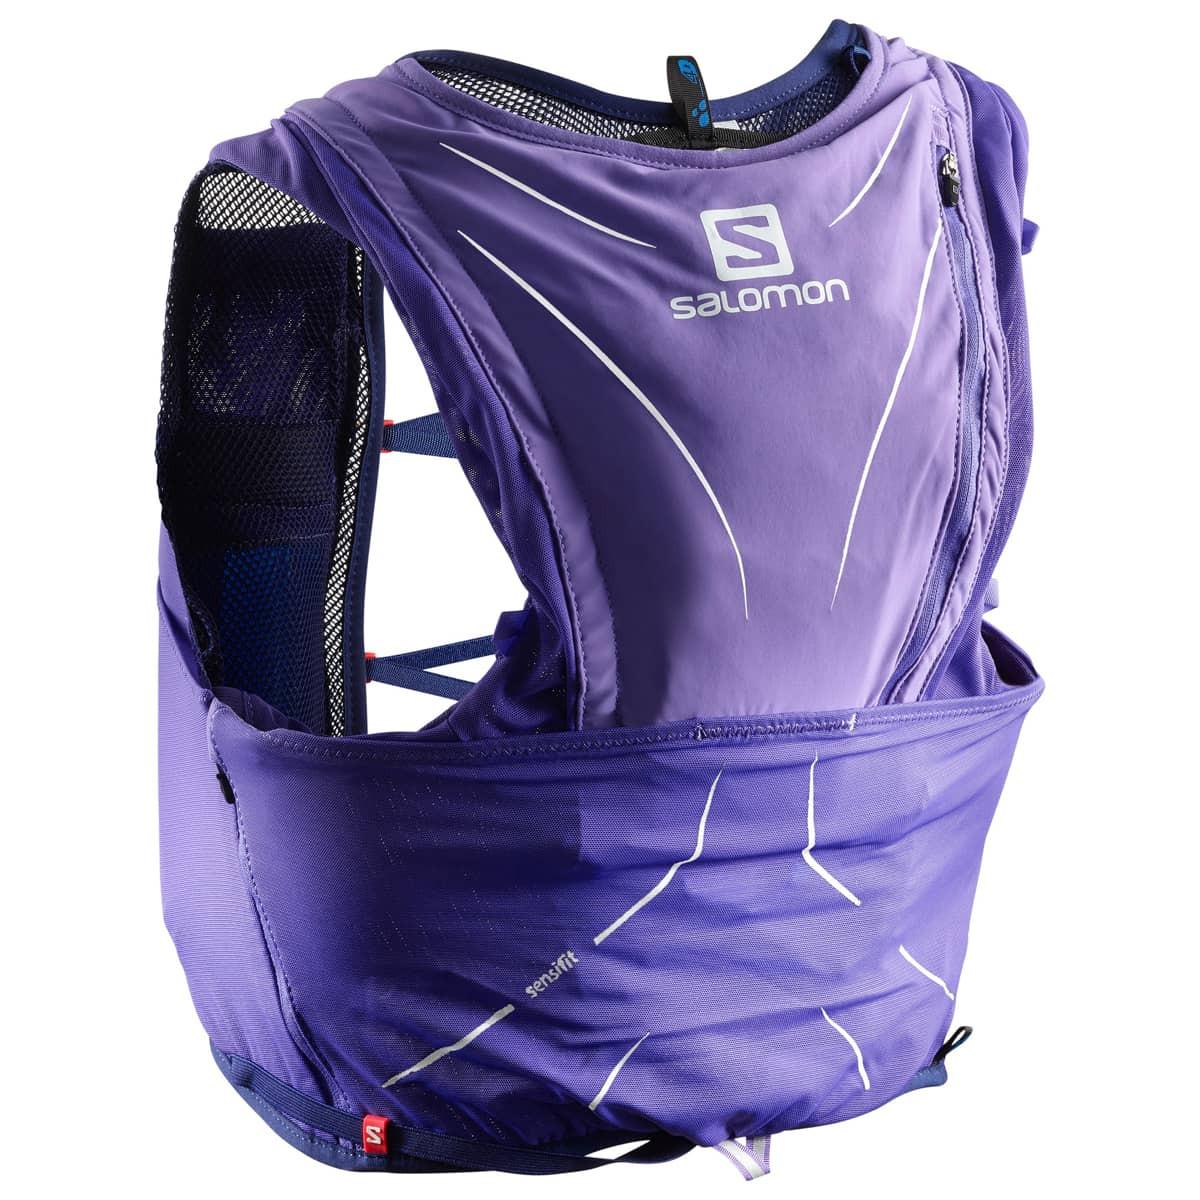 570fa7bc7d ... Salomon Bag Adv Skin 12 Set Purple Opulence/Medieval Blue ...